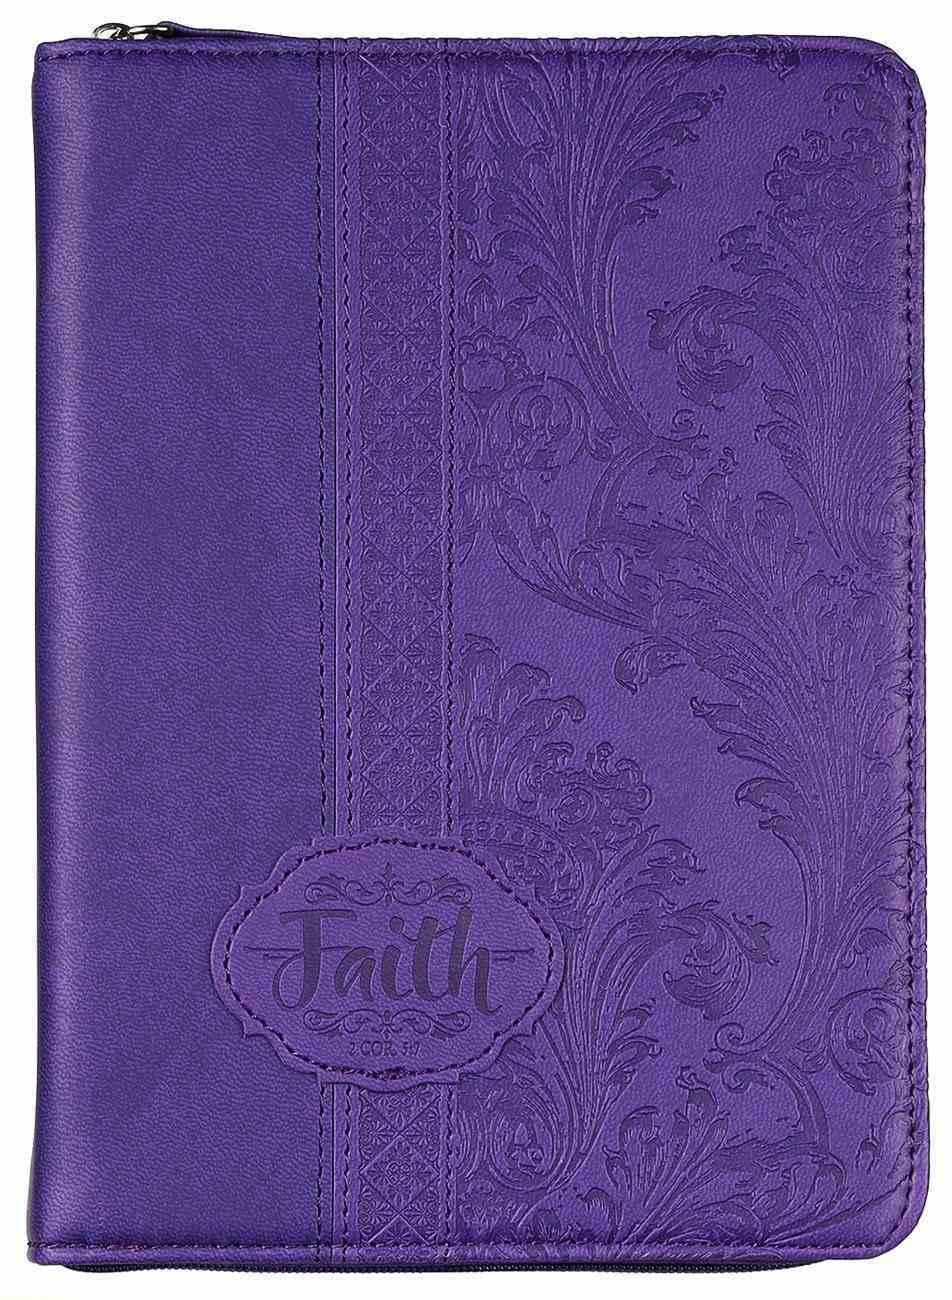 Journal Divine Details: Faith, Dark Purple, , Zippered Closure (2 Cor 5:7) Imitation Leather